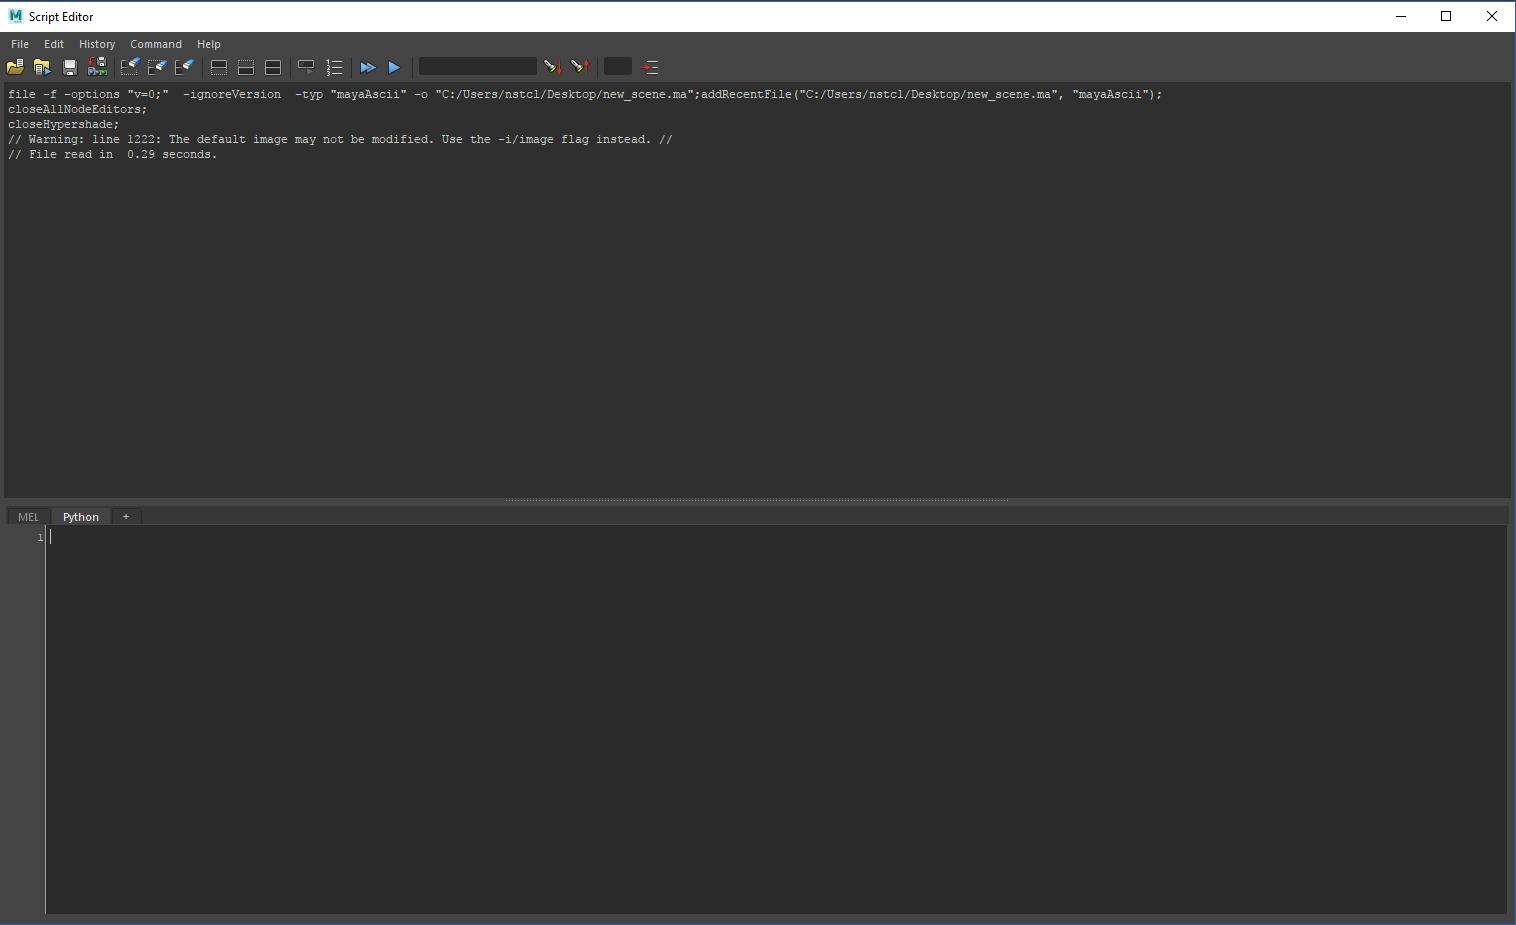 Script Editor Image